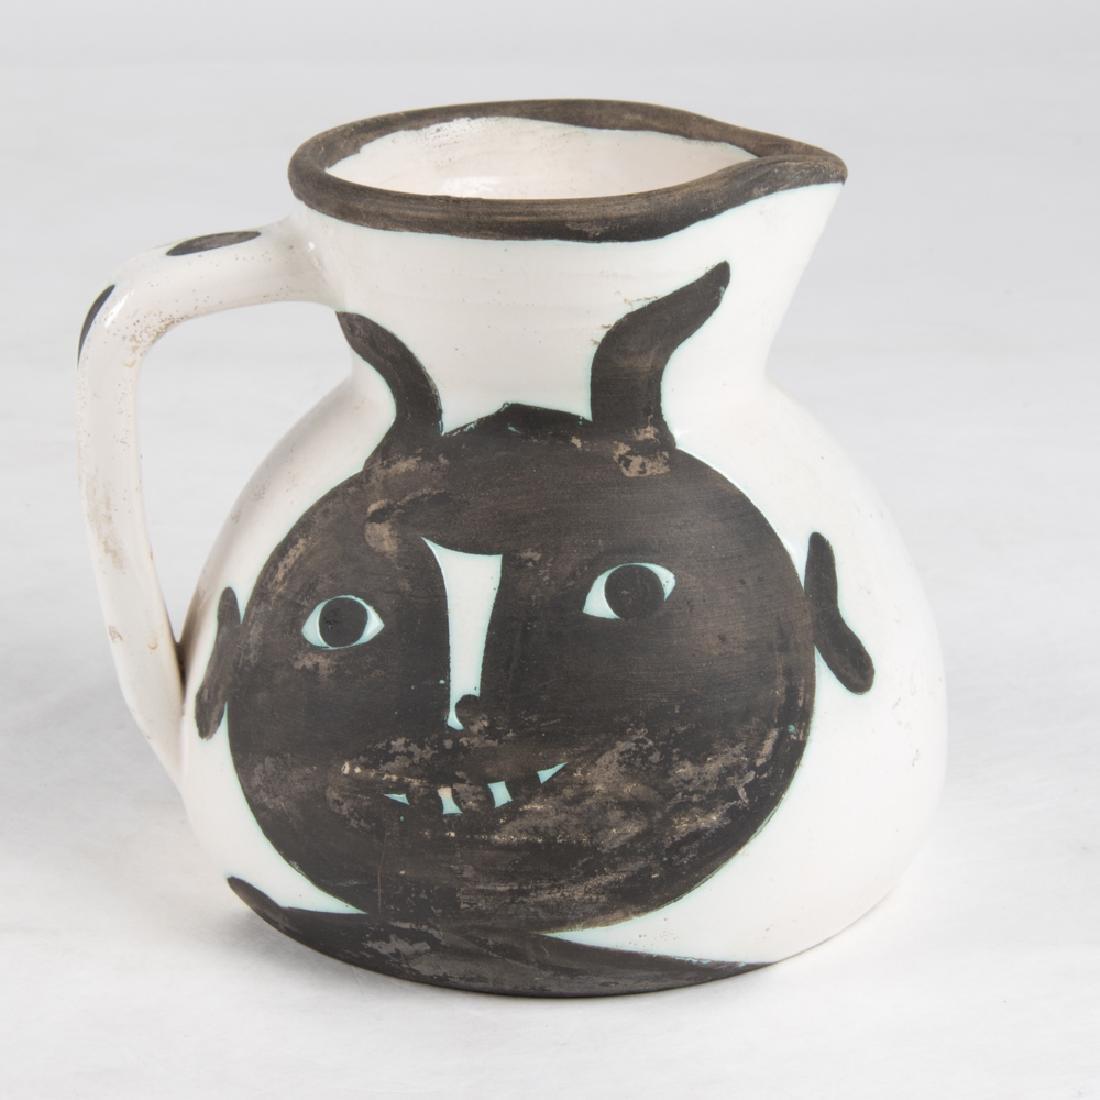 Pablo Picasso (1881-1973) Pichet Tetes, 1956, White